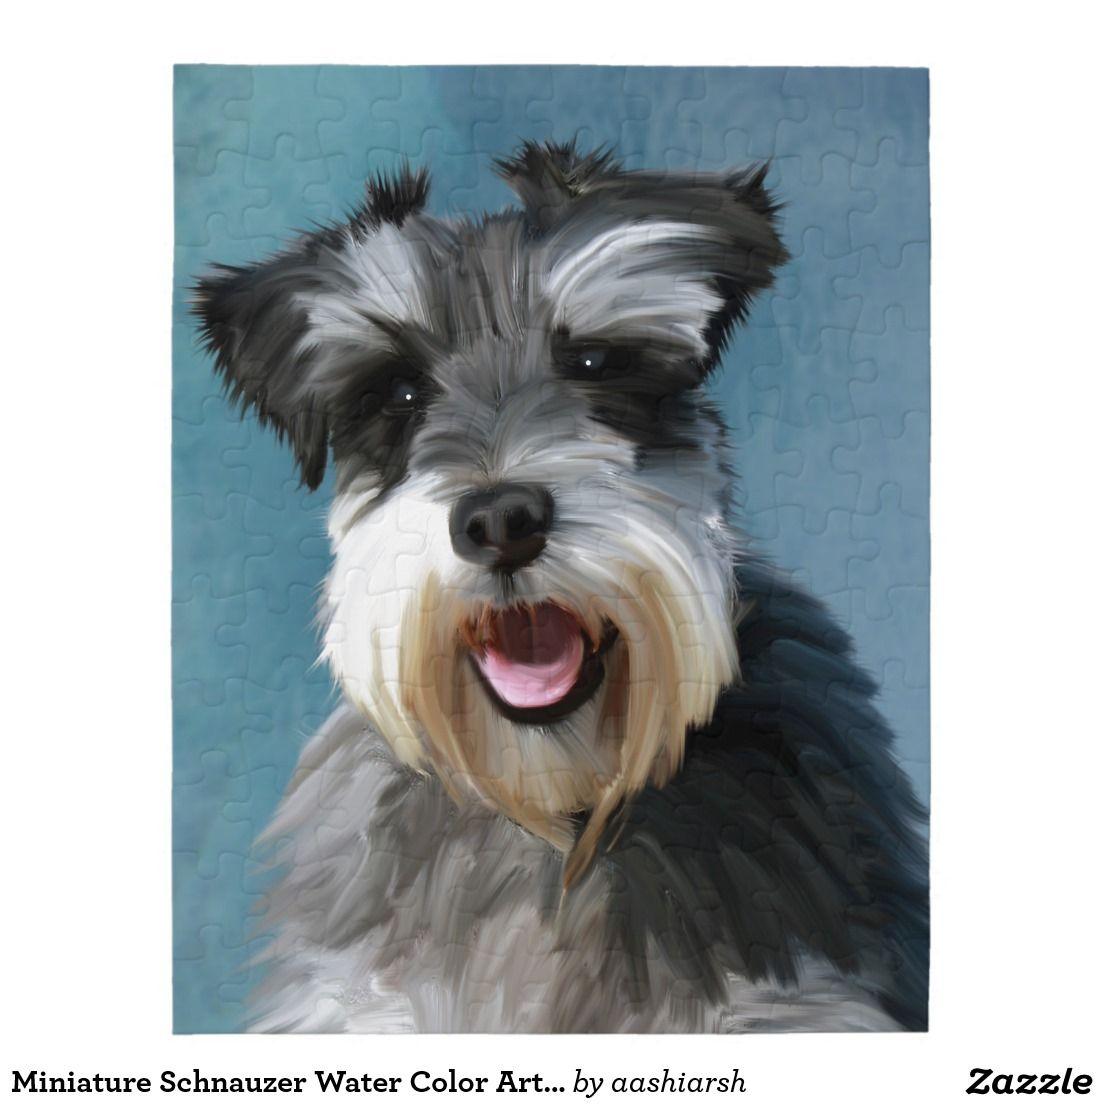 Miniature Schnauzer Water Color Art Painting Jigsaw Puzzle Zazzle Com In 2020 Dog Portraits Painting Schnauzer Art Schnauzer